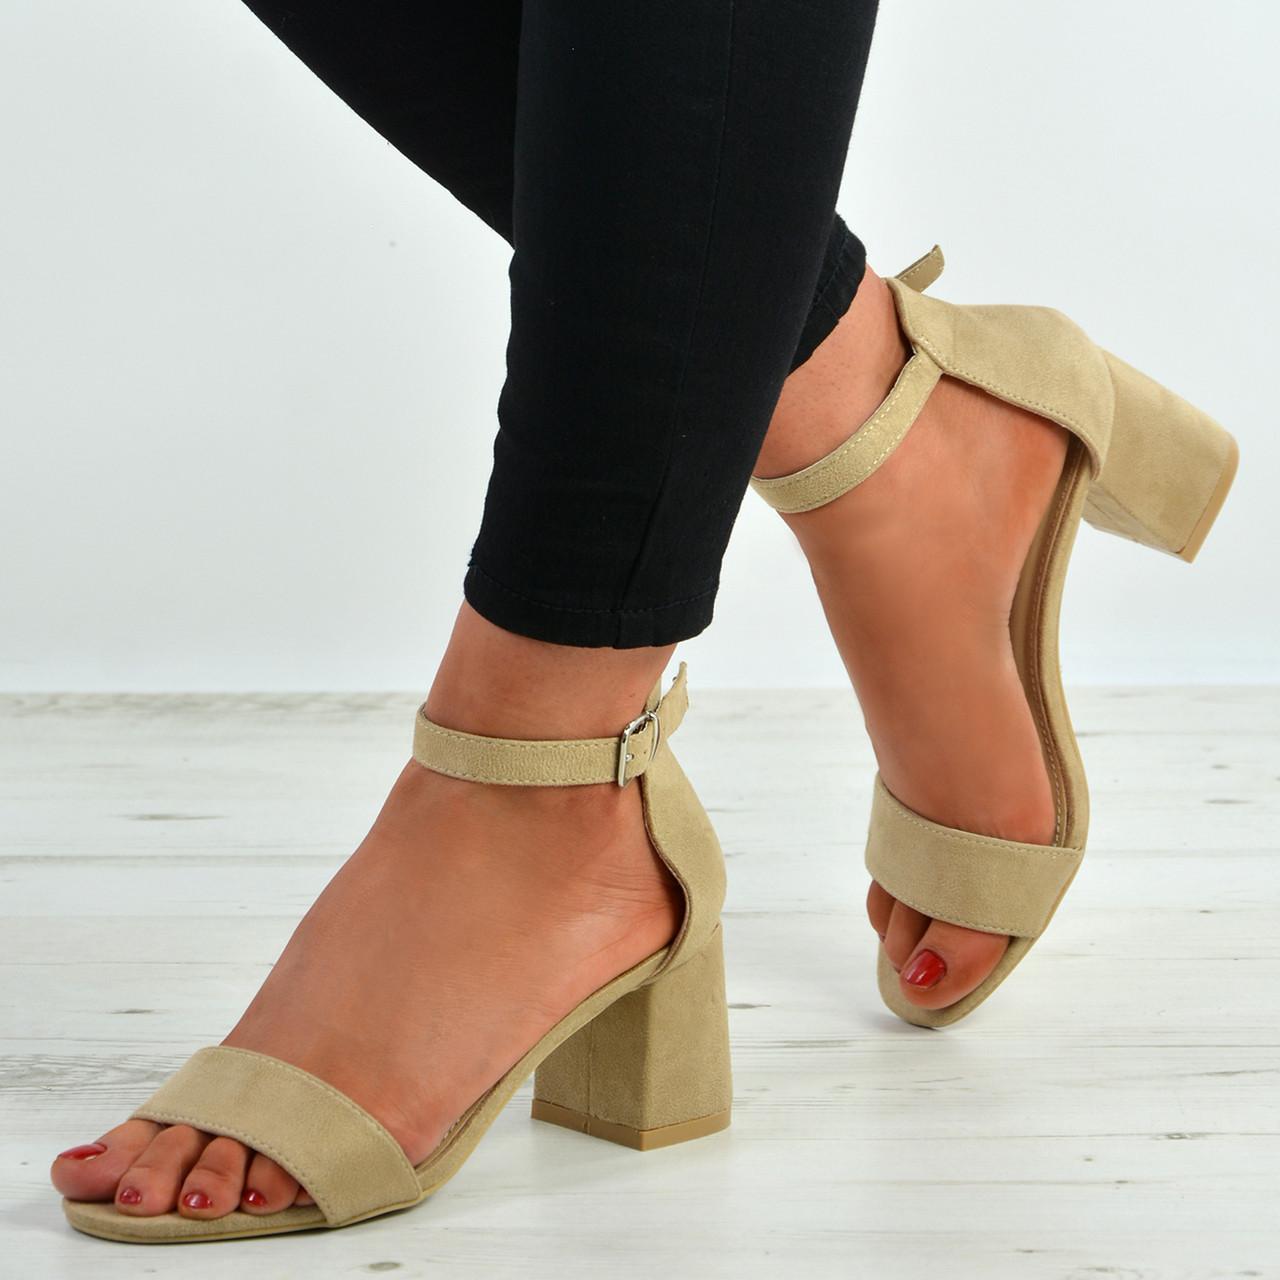 abc3d3e41ec New Womens Ladies Mid Block Heel Ankle Strap Peep Toe Shoes Sandals ...